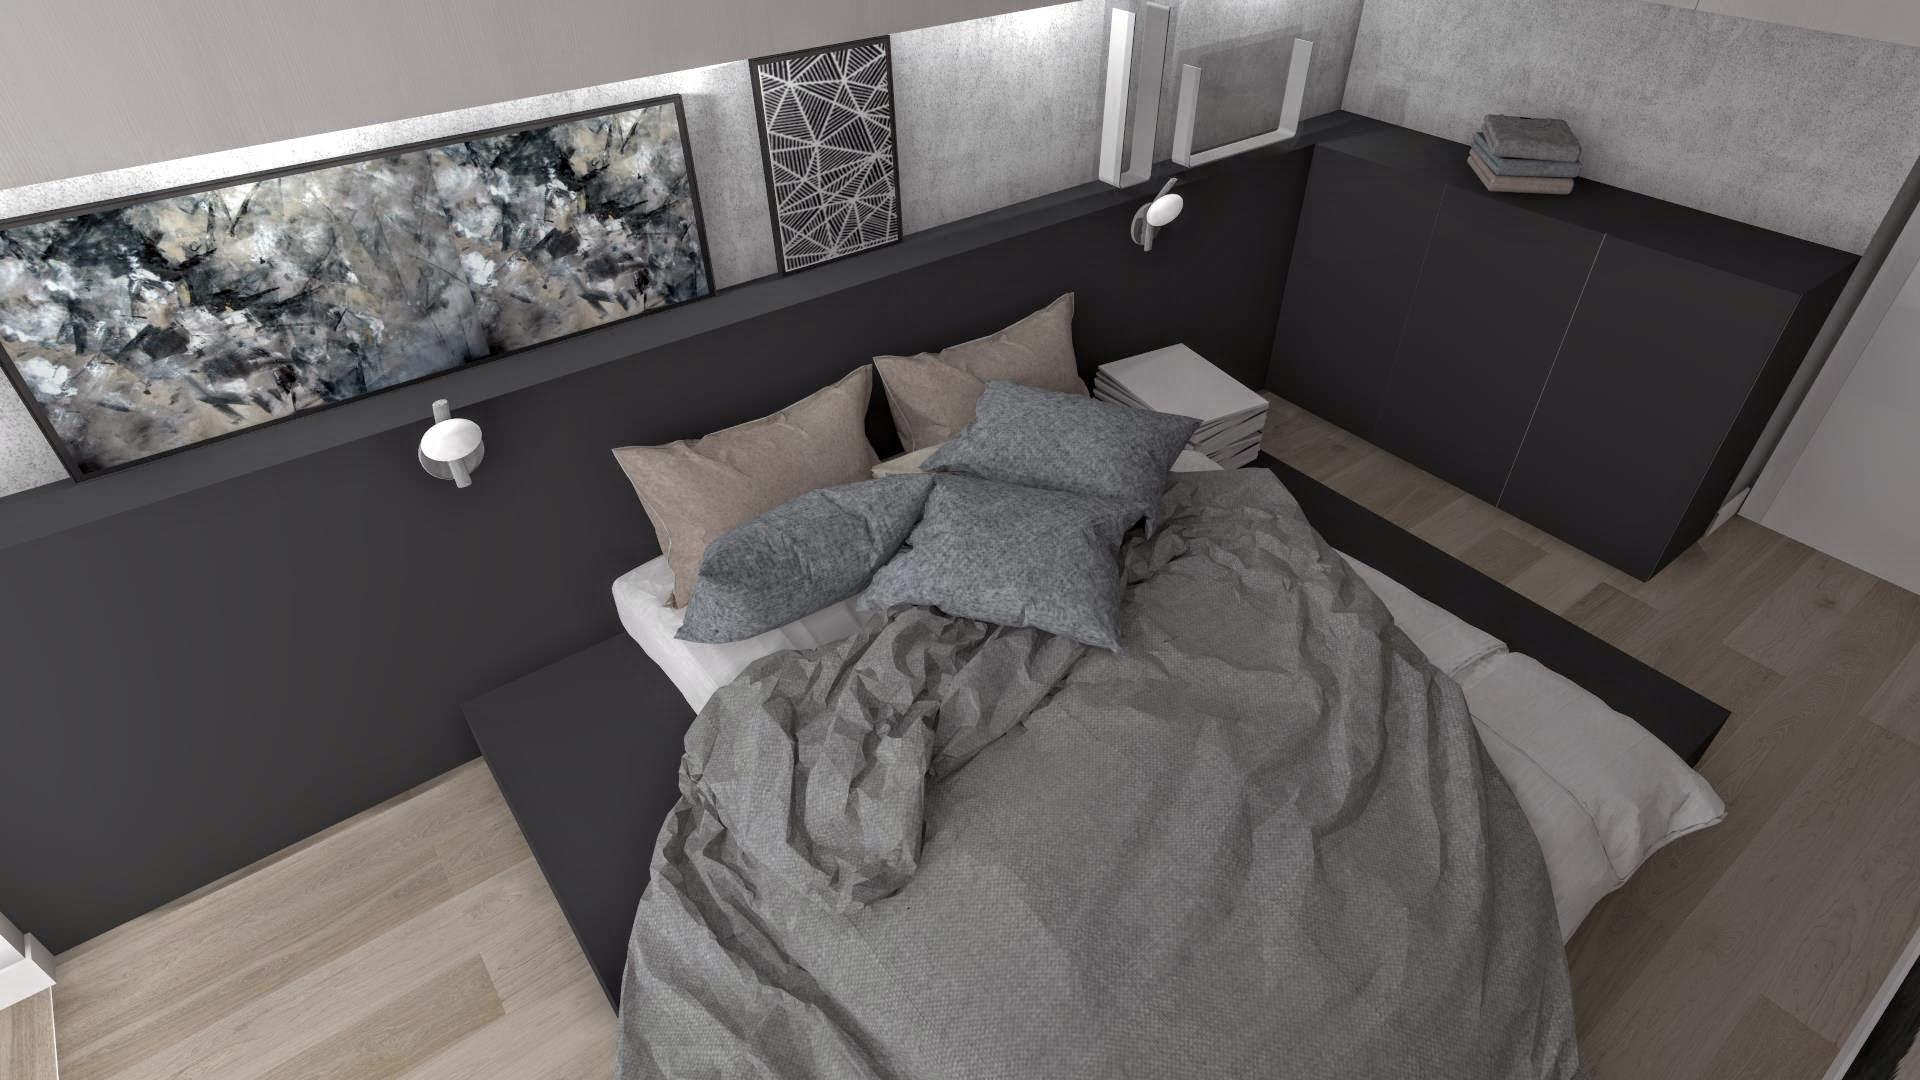 projekty_wnętrz_lubin_legnica_głogów_designbox_marta_bednarska_małek